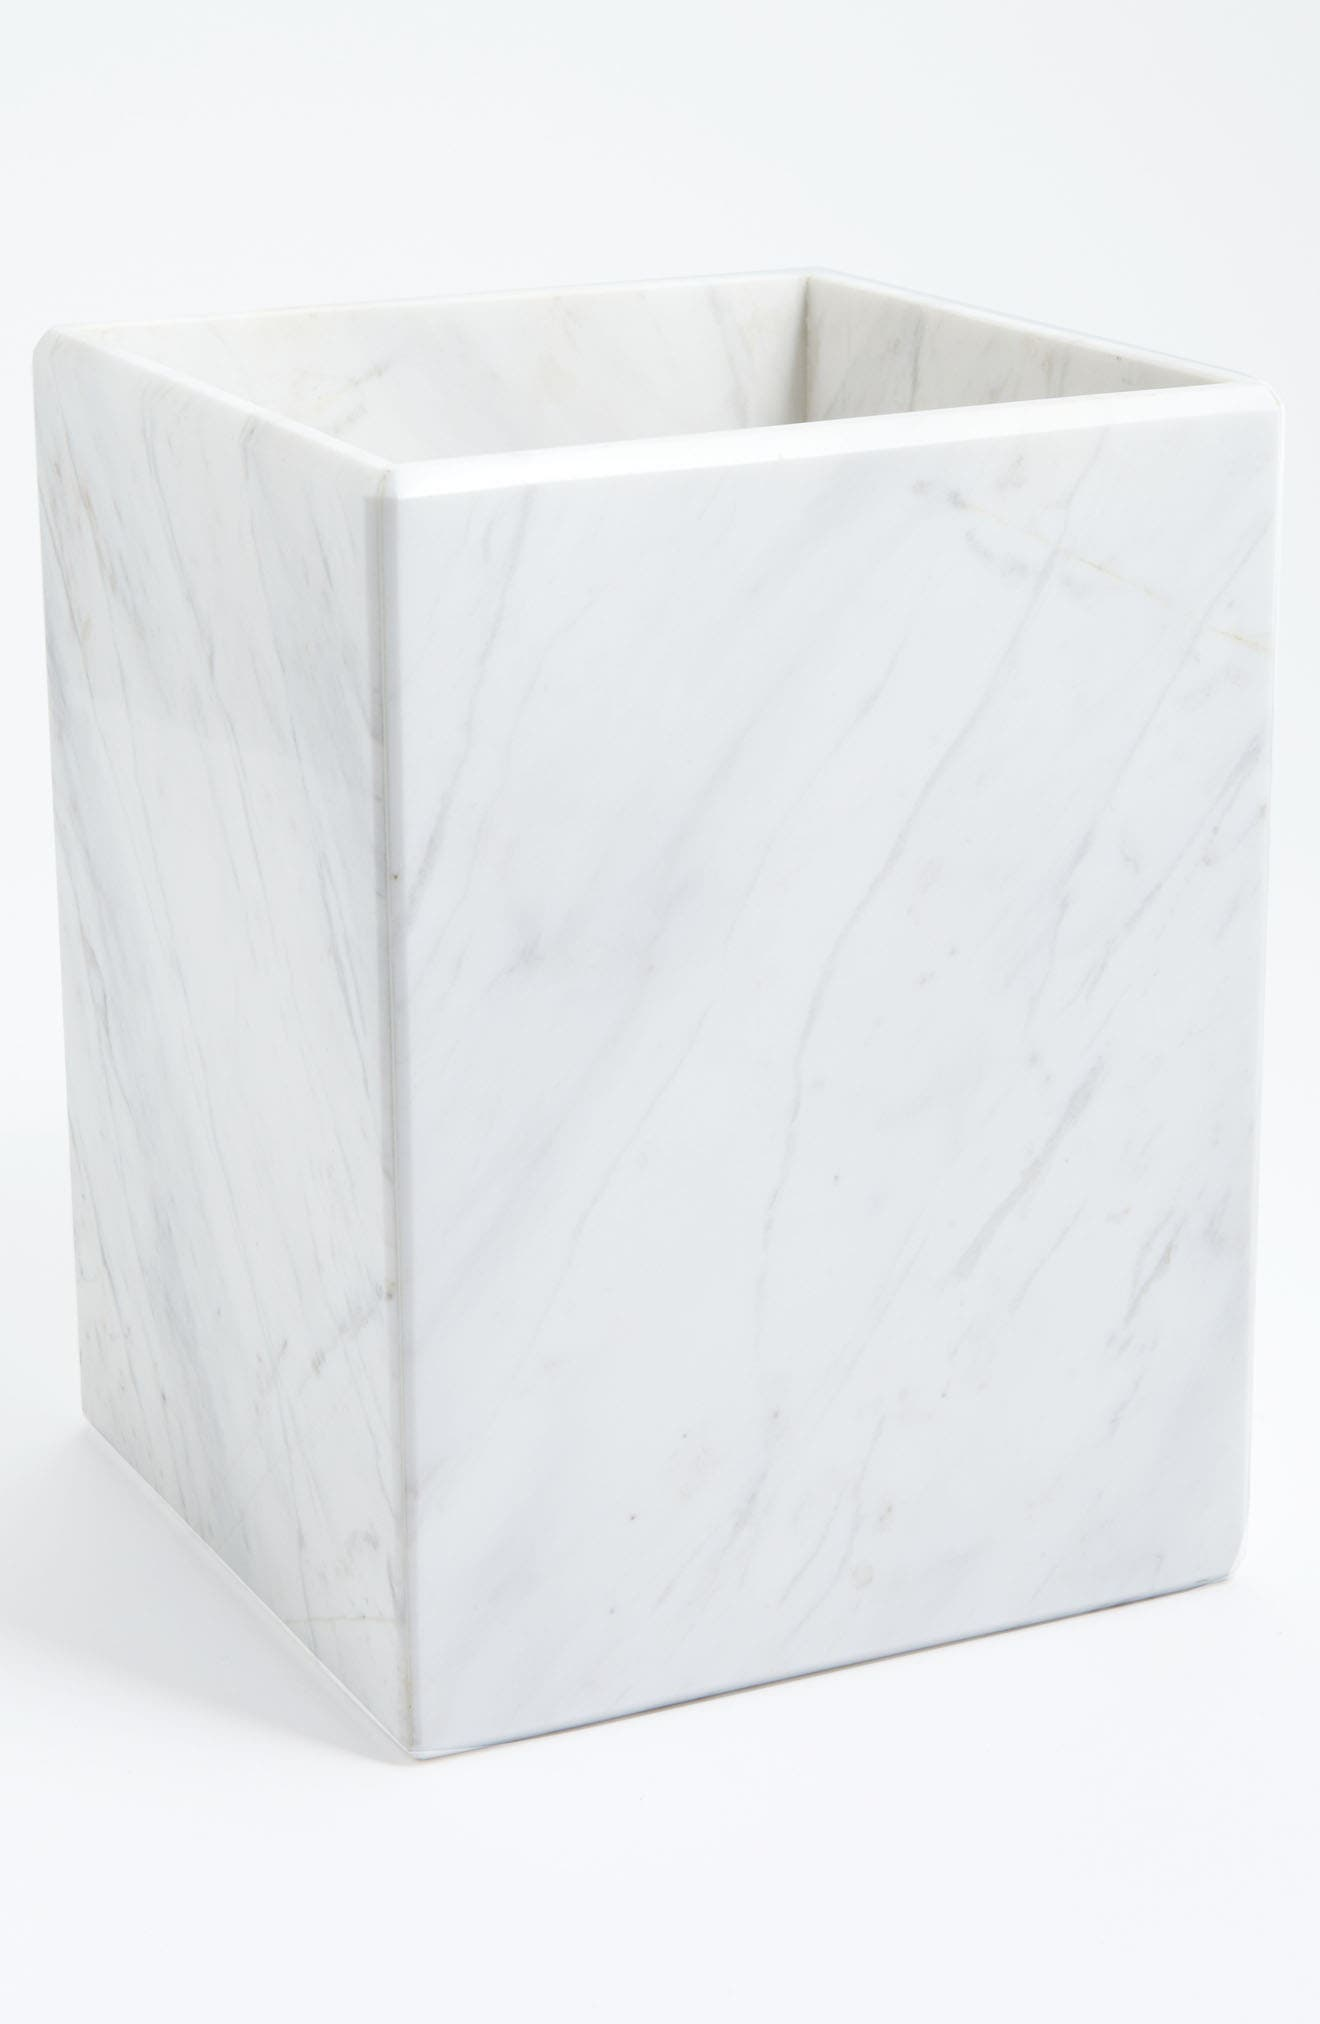 Studio 'Luna' White Marble Wastebasket,                             Main thumbnail 1, color,                             White